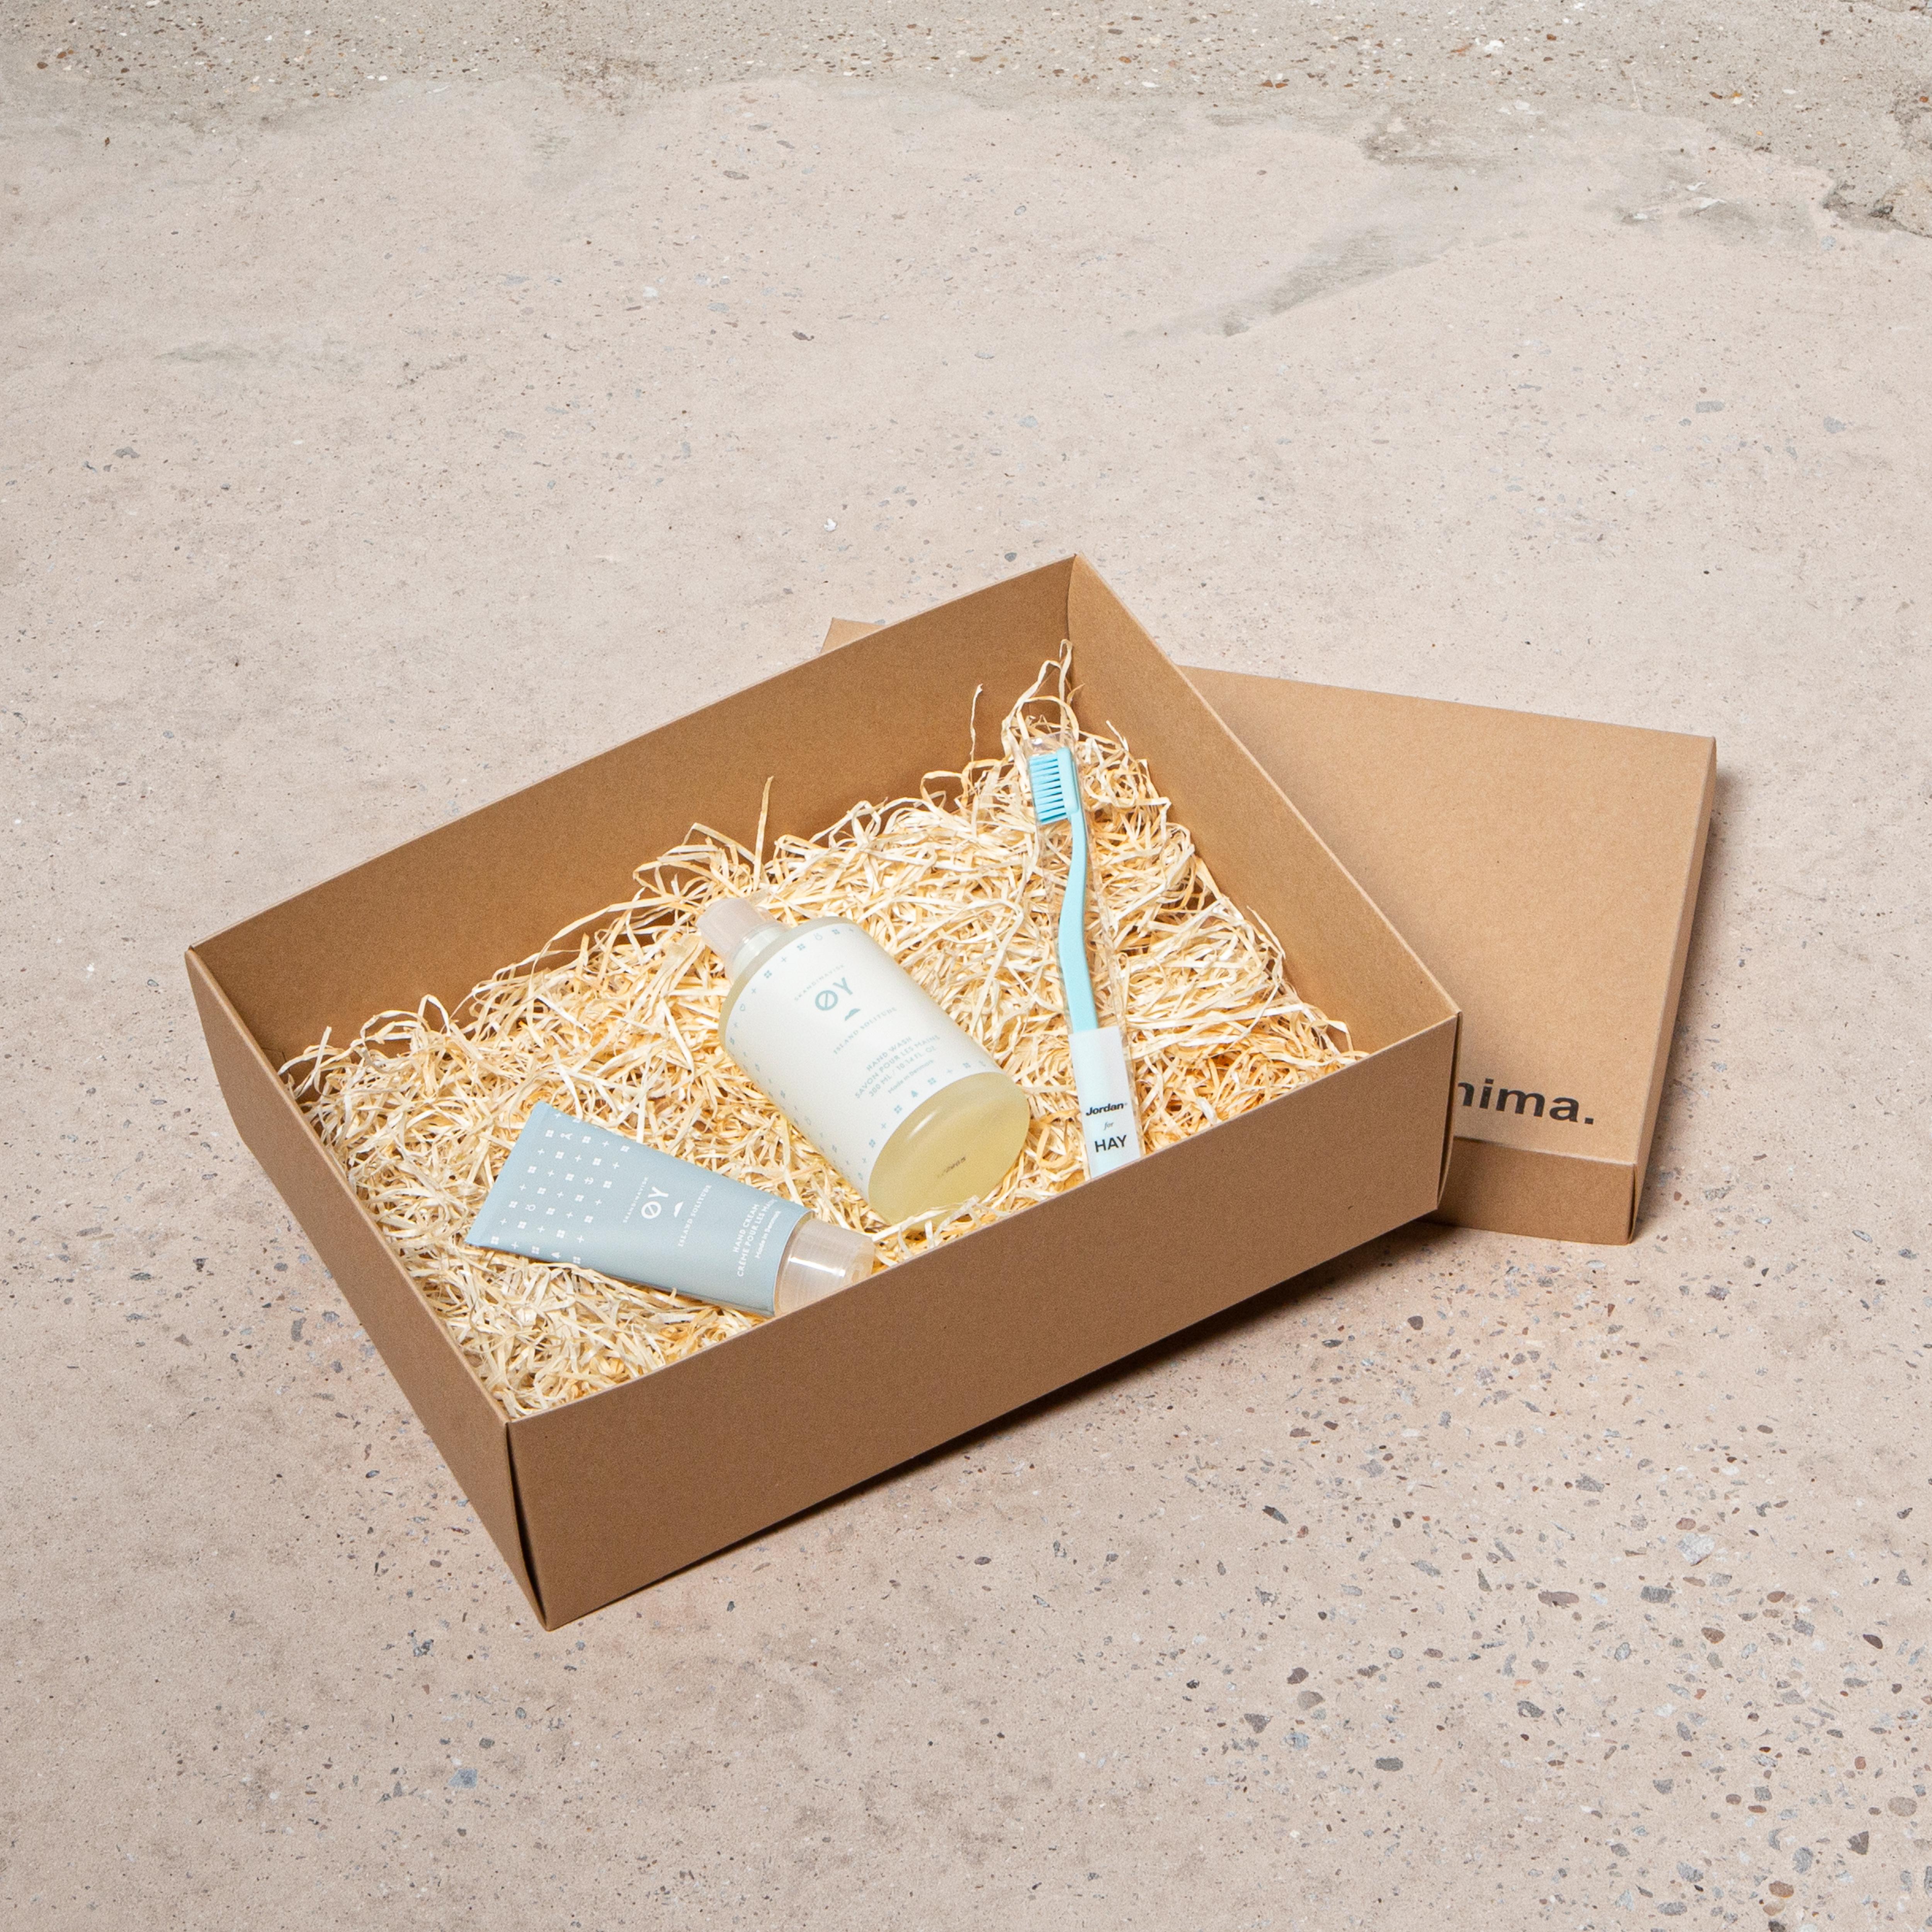 Minima Hamper 35 Home Box contemporary designer homeware